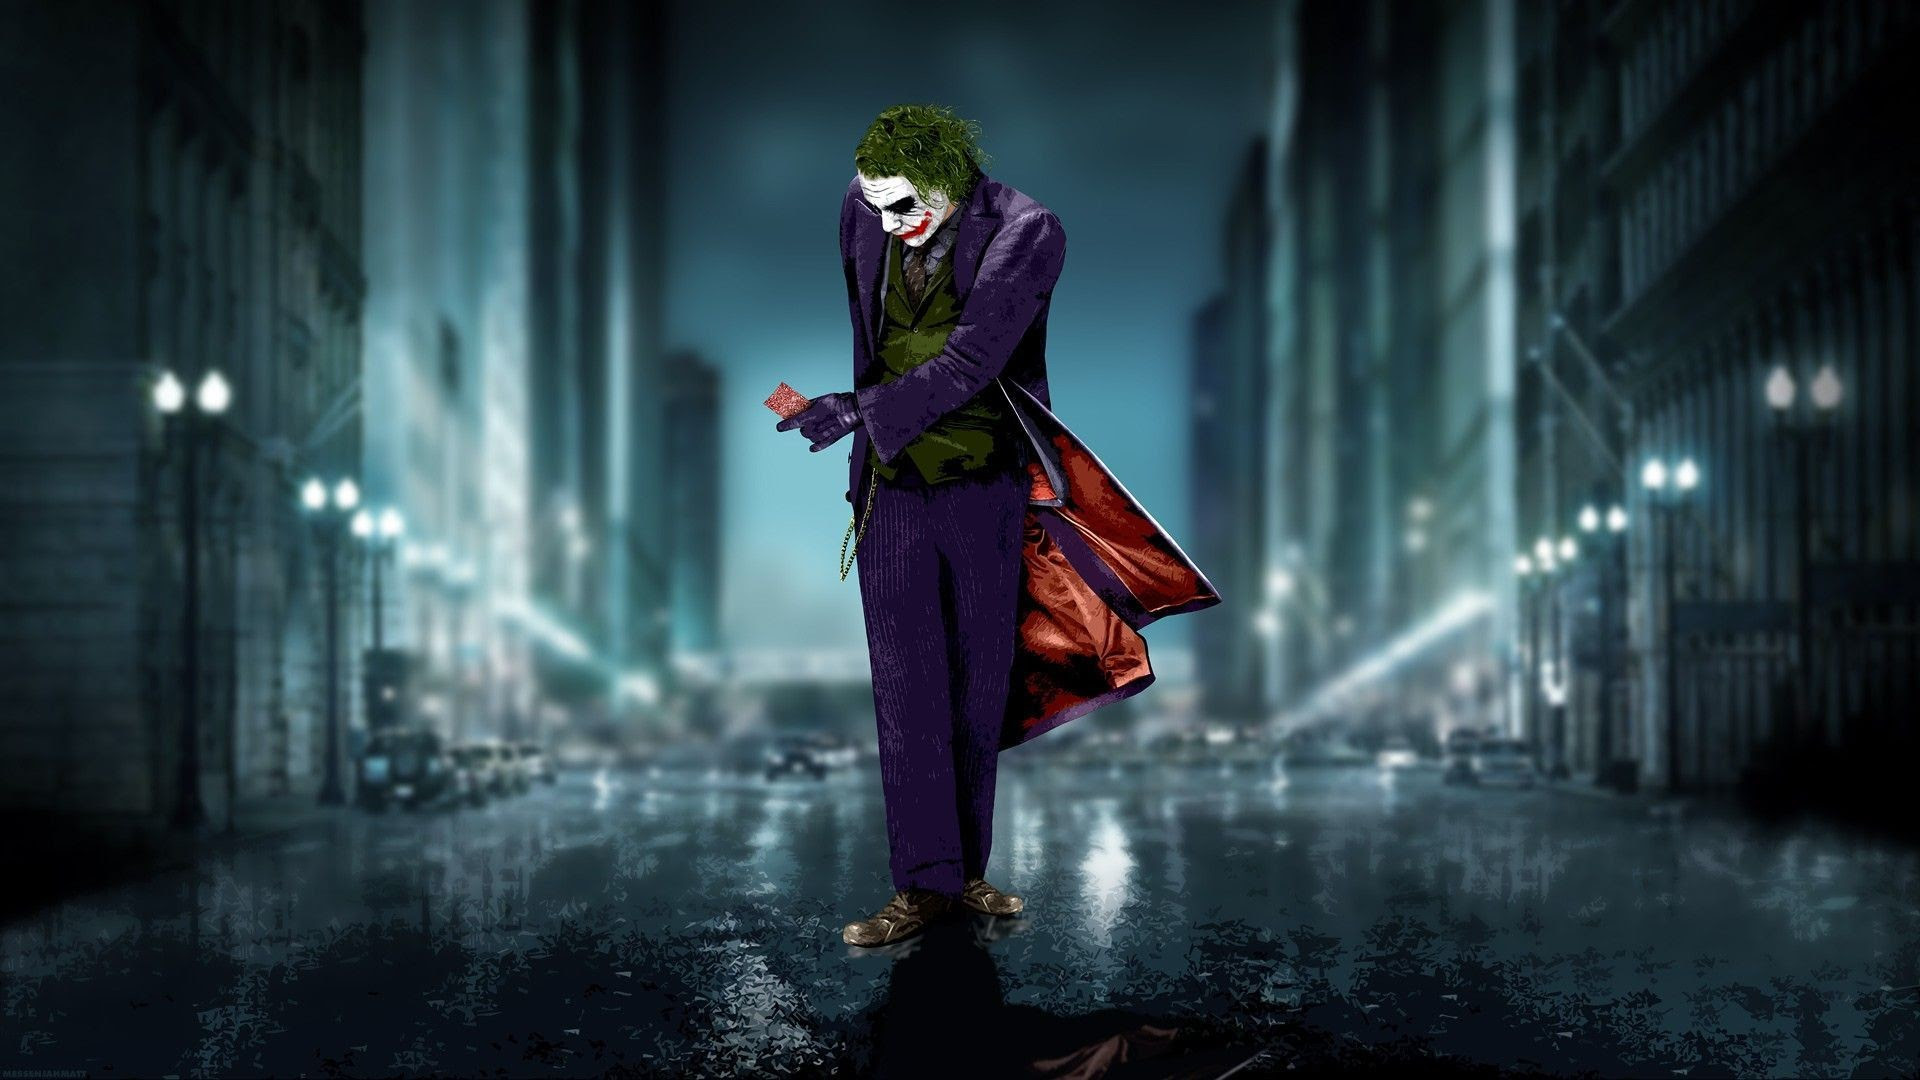 Woowpaper 3d Hd Wallpapers Joker